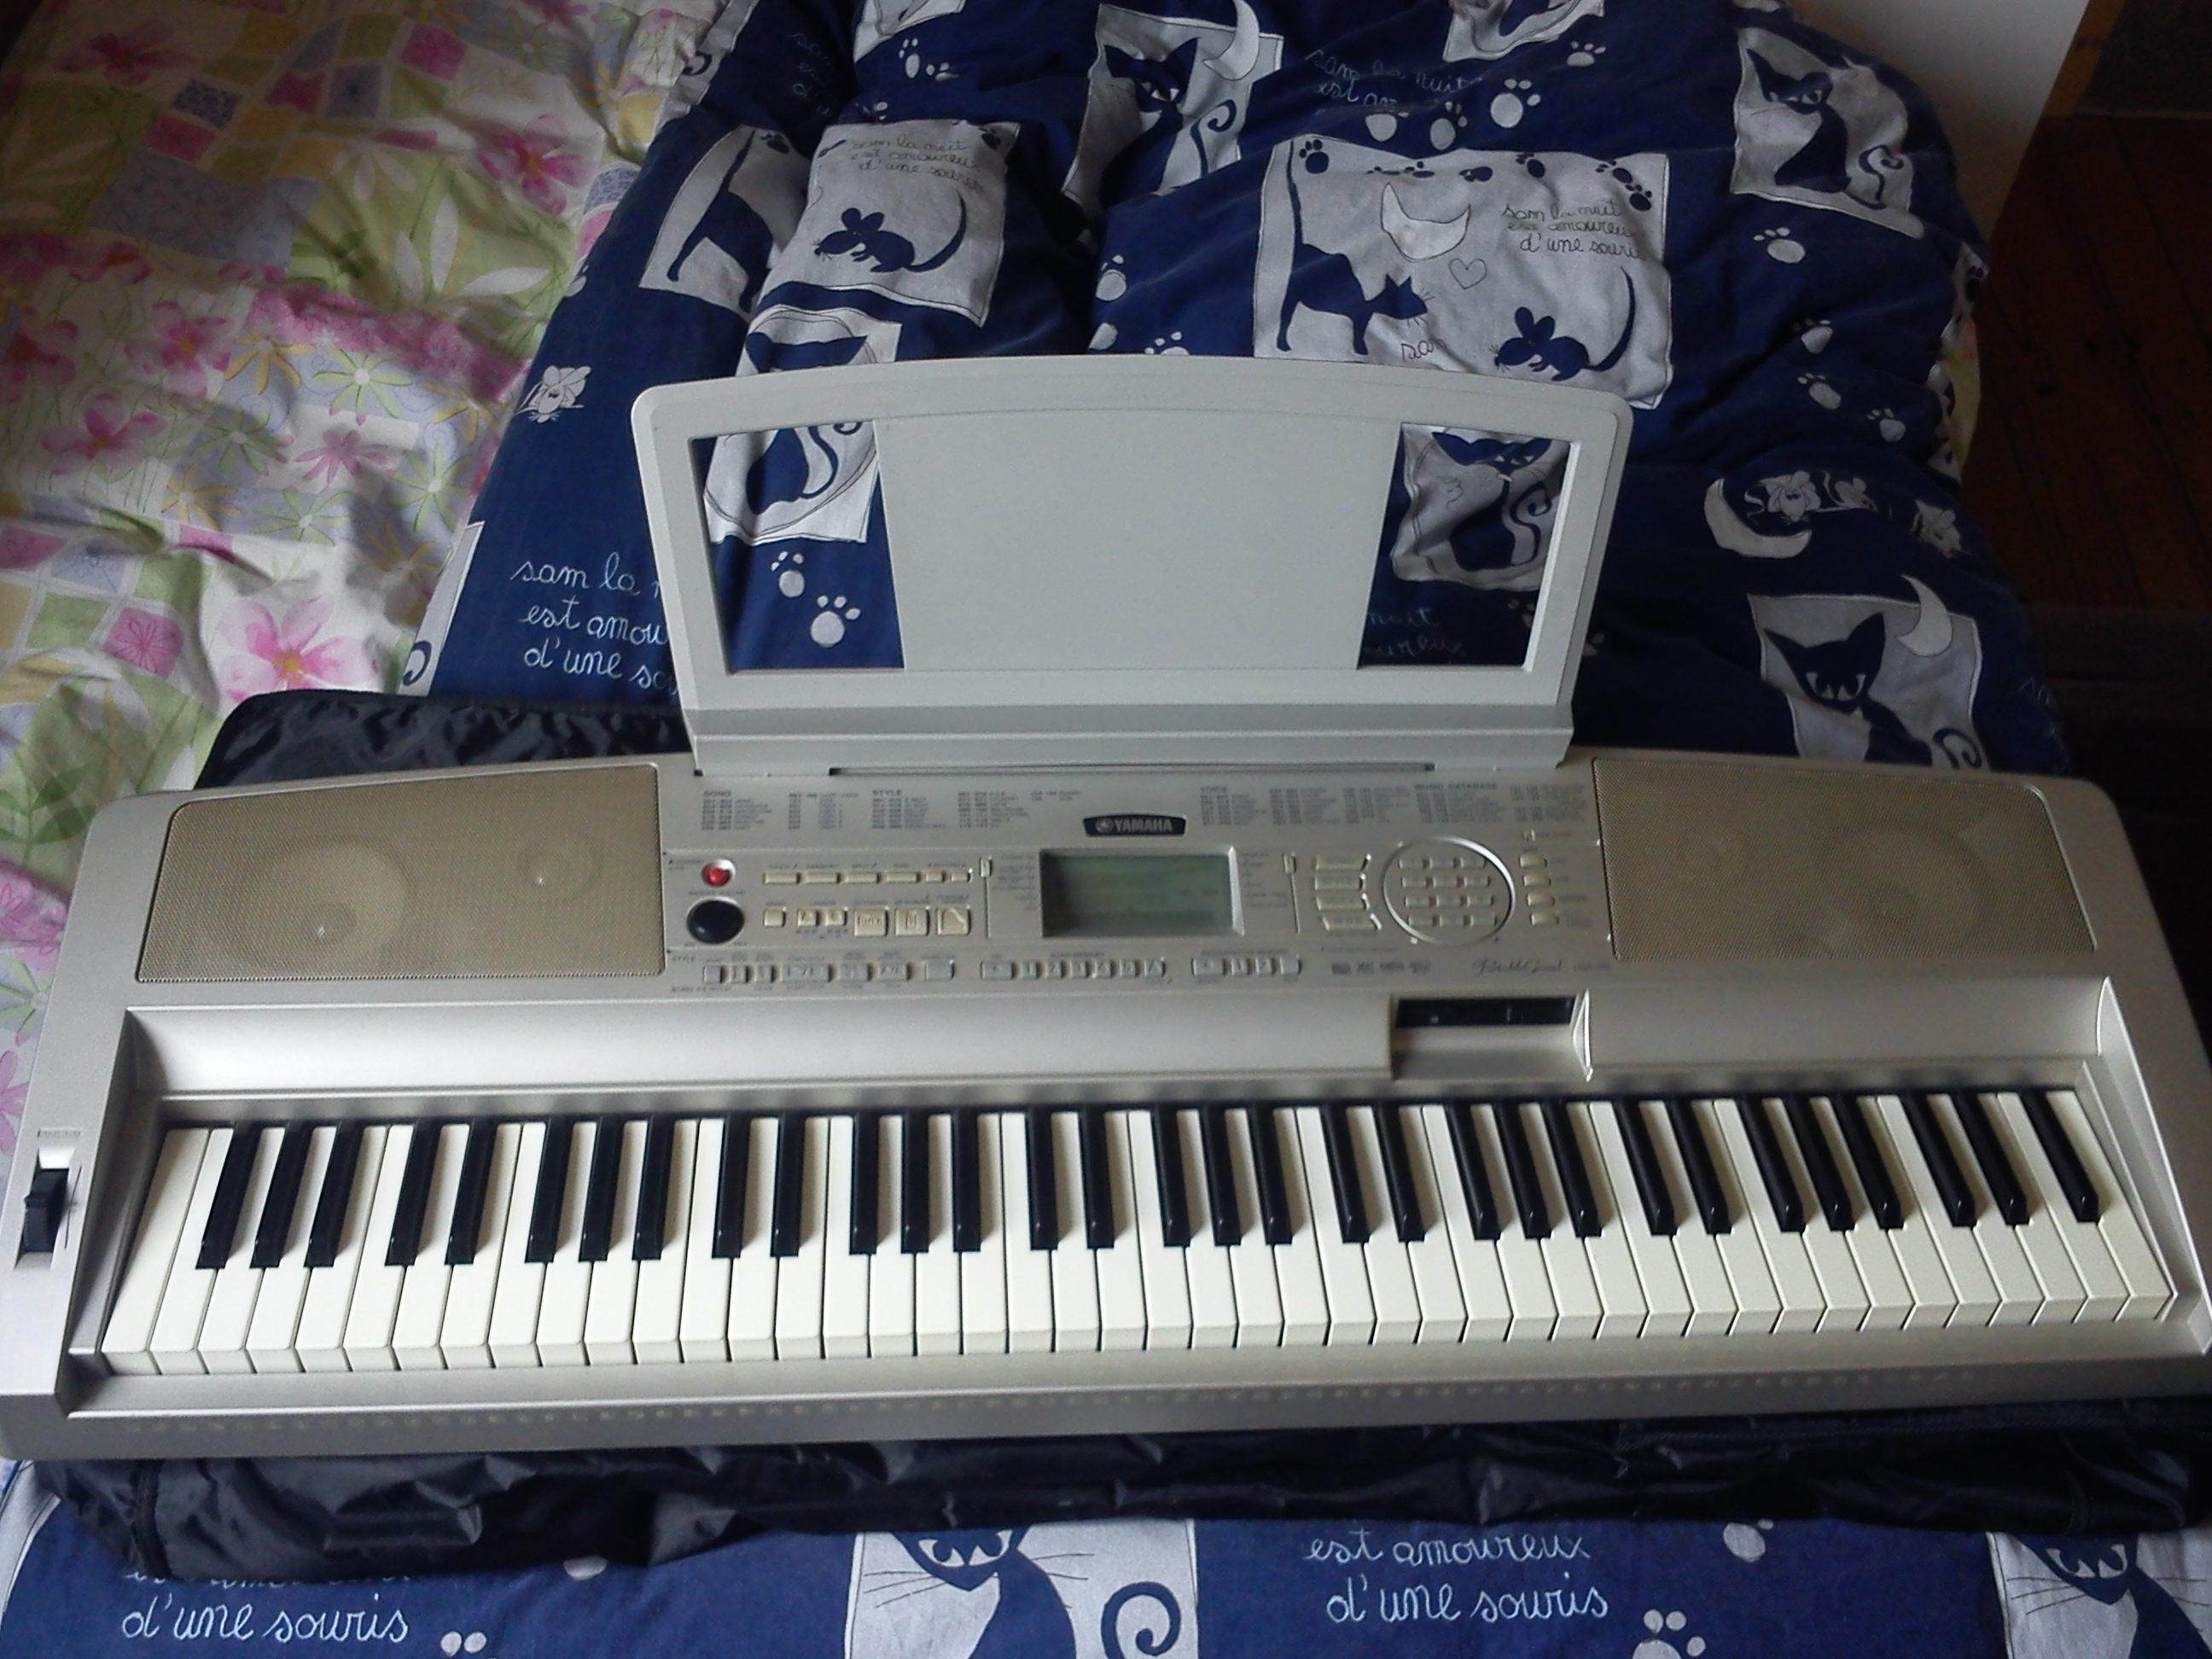 Yamaha dgx 300 image 1674007 audiofanzine for Yamaha dgx 230 manual